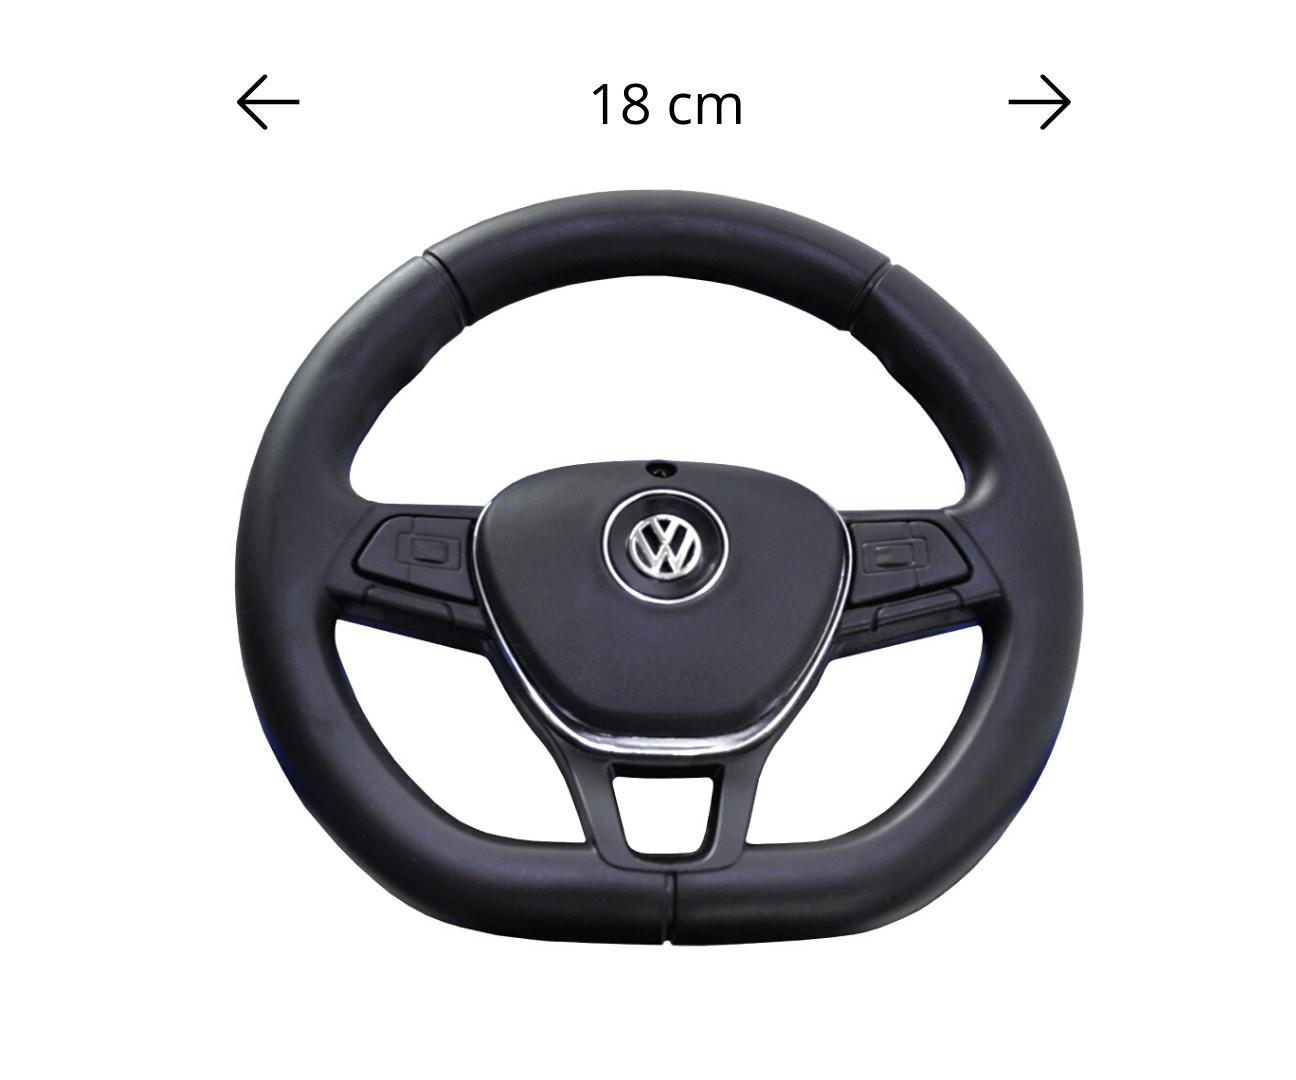 Pealeistutav auto VOLKSWAGEN T-ROC valge